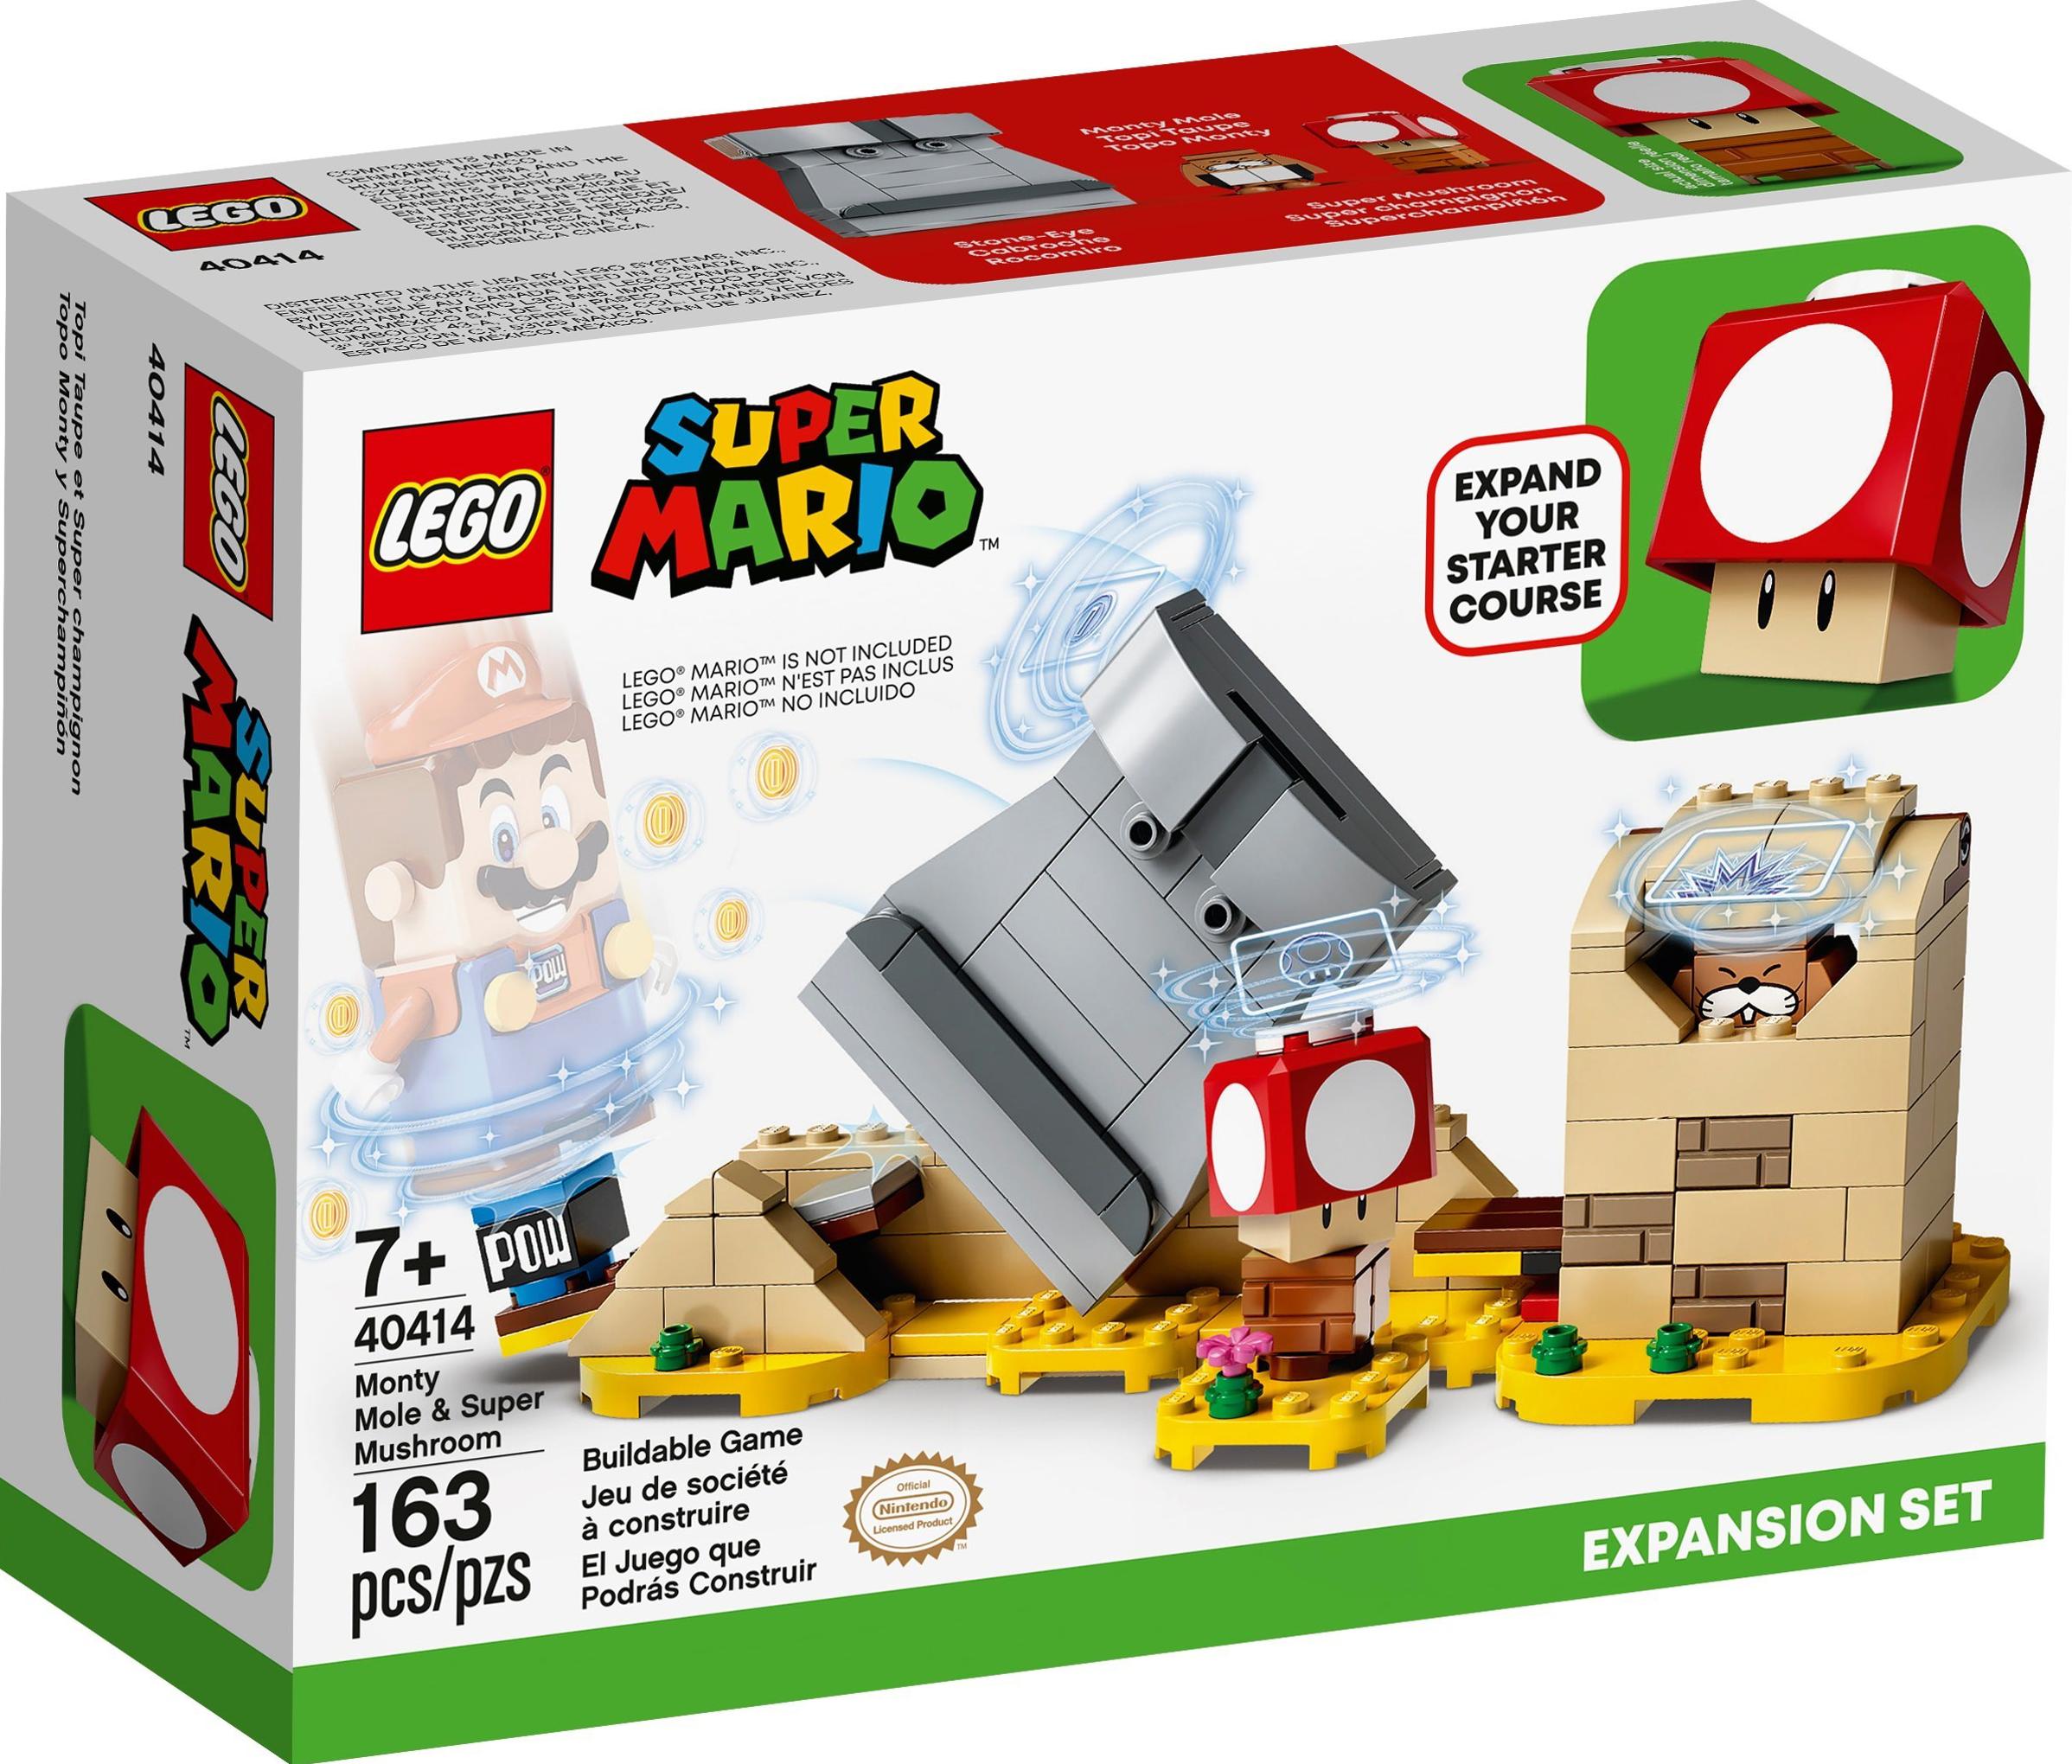 Monty Mole & Super Mushroom Expansion Set